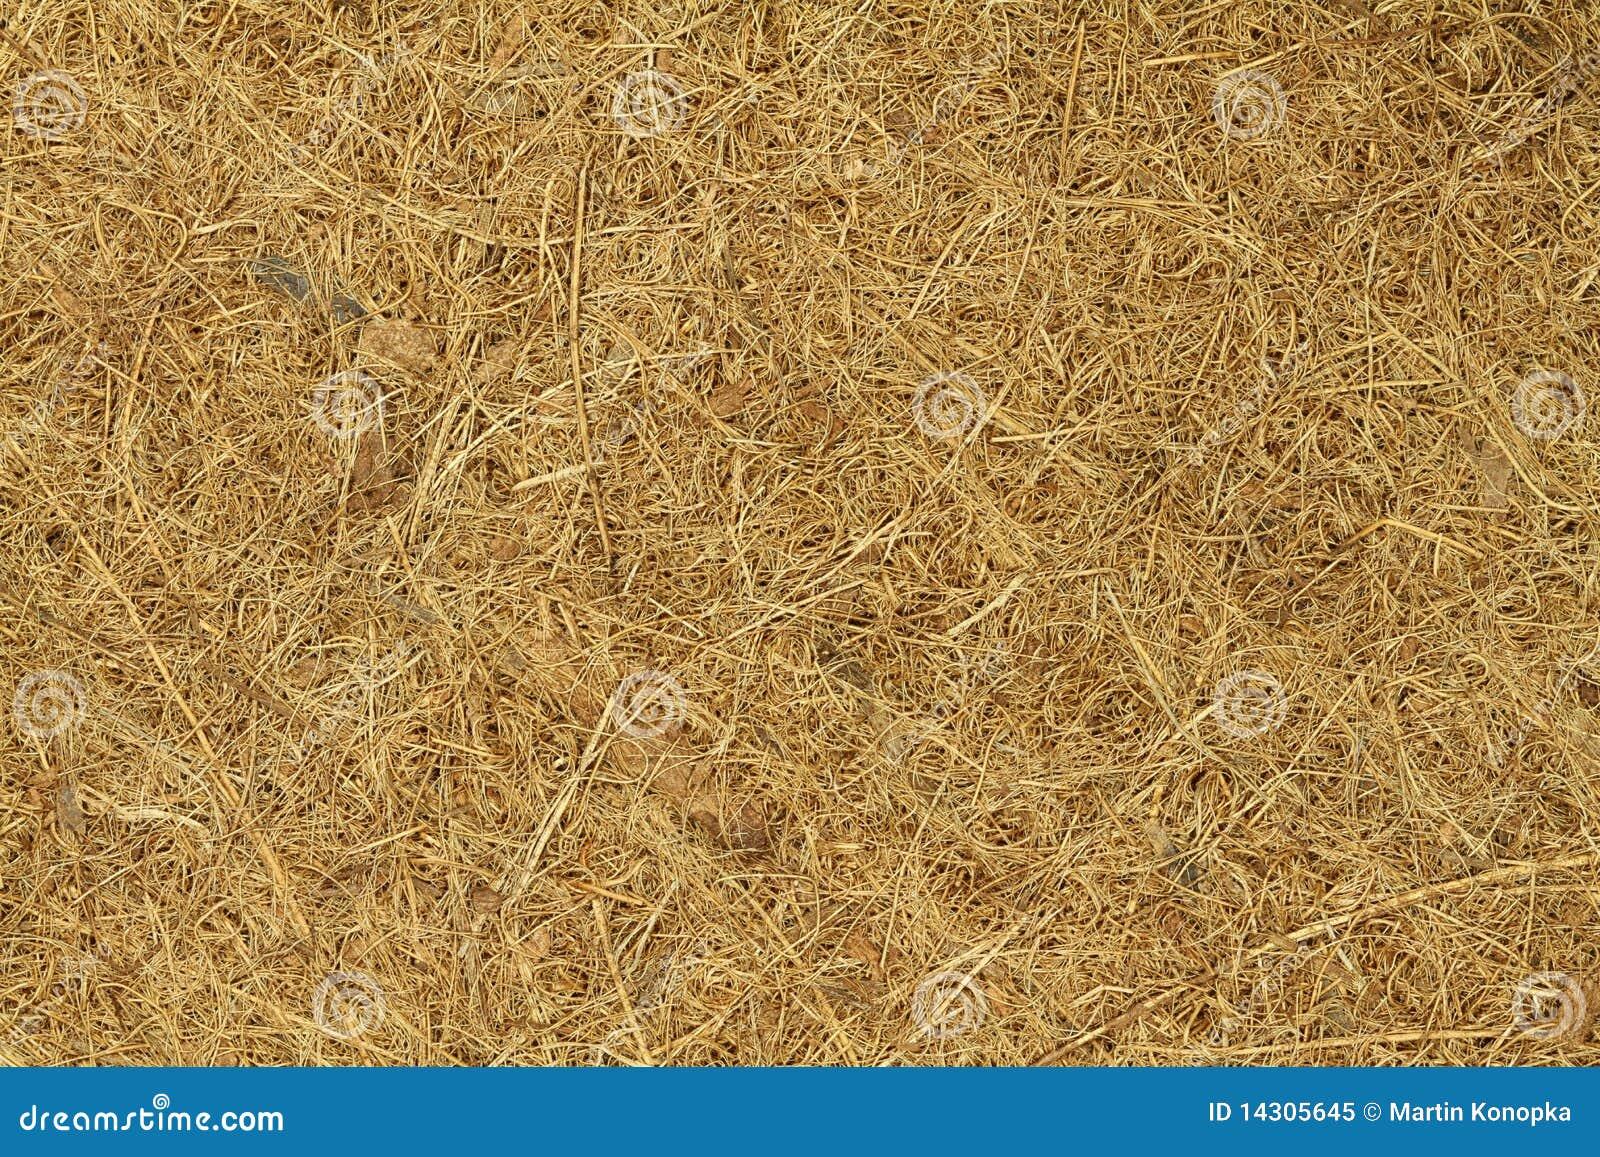 Coconut Matting Royalty Free Stock Photo Image 14305645